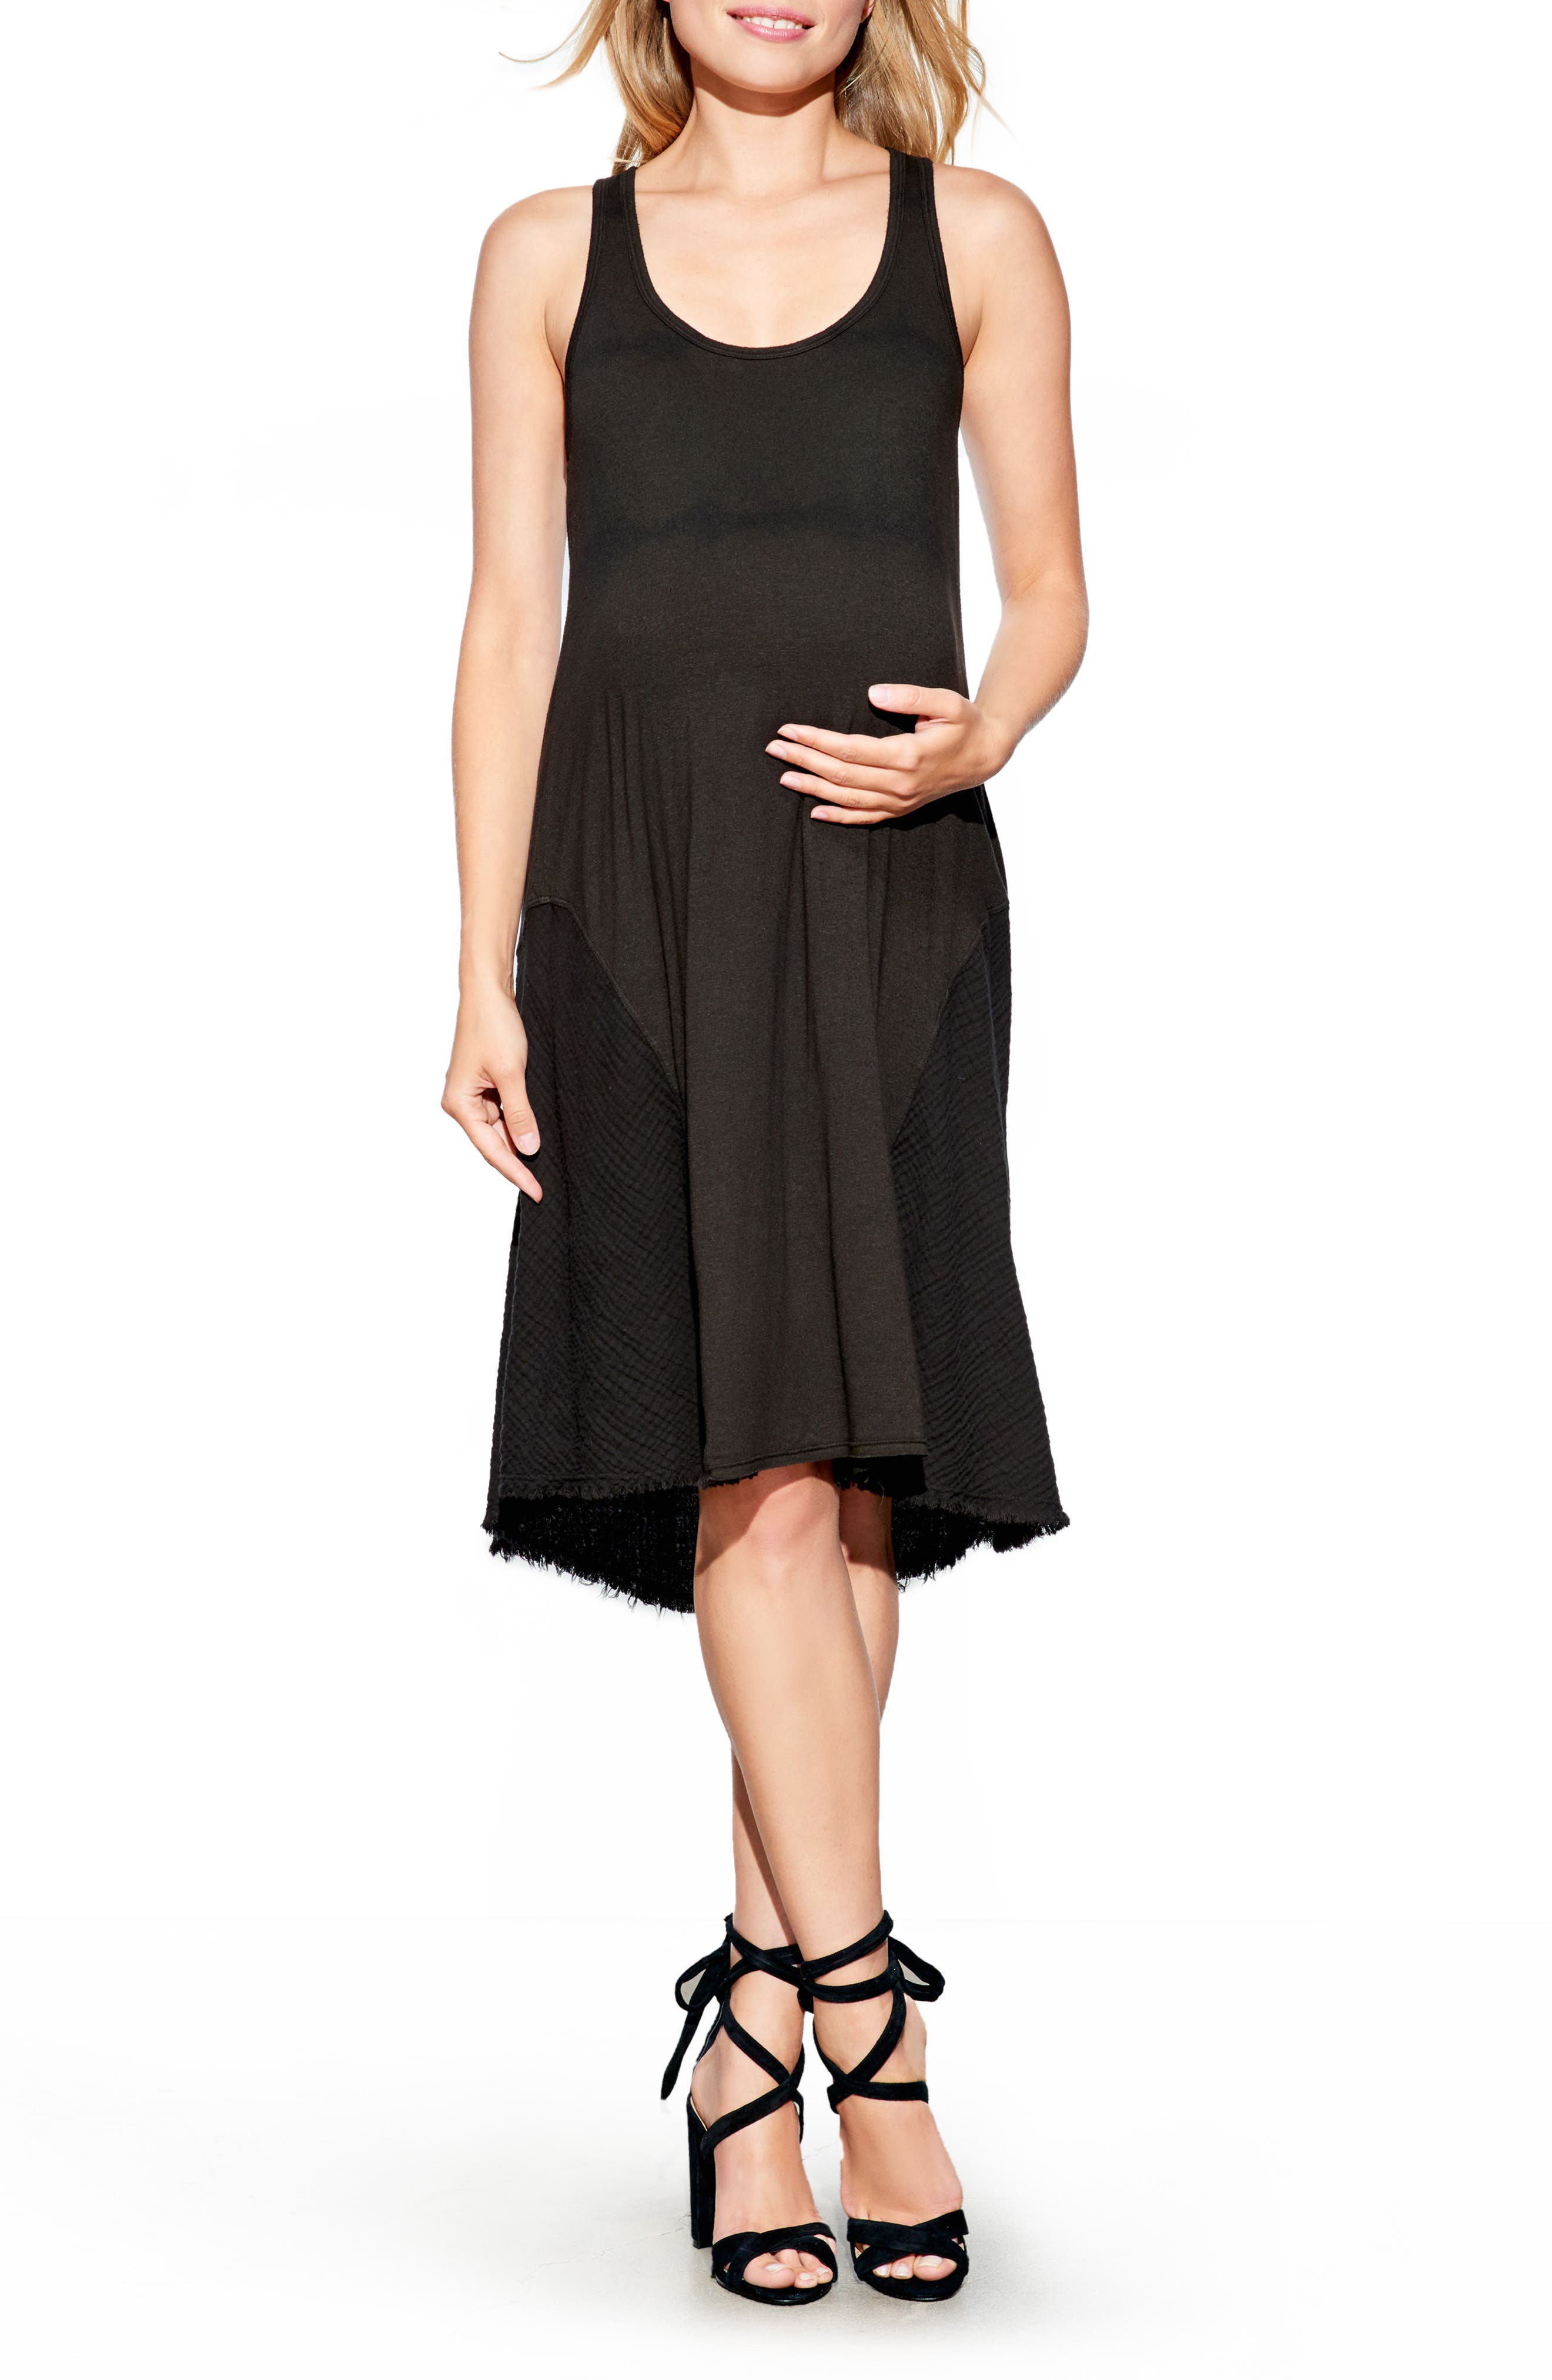 Alternate Image 1 Selected - Maternal America High/Low Maternity Tank Dress